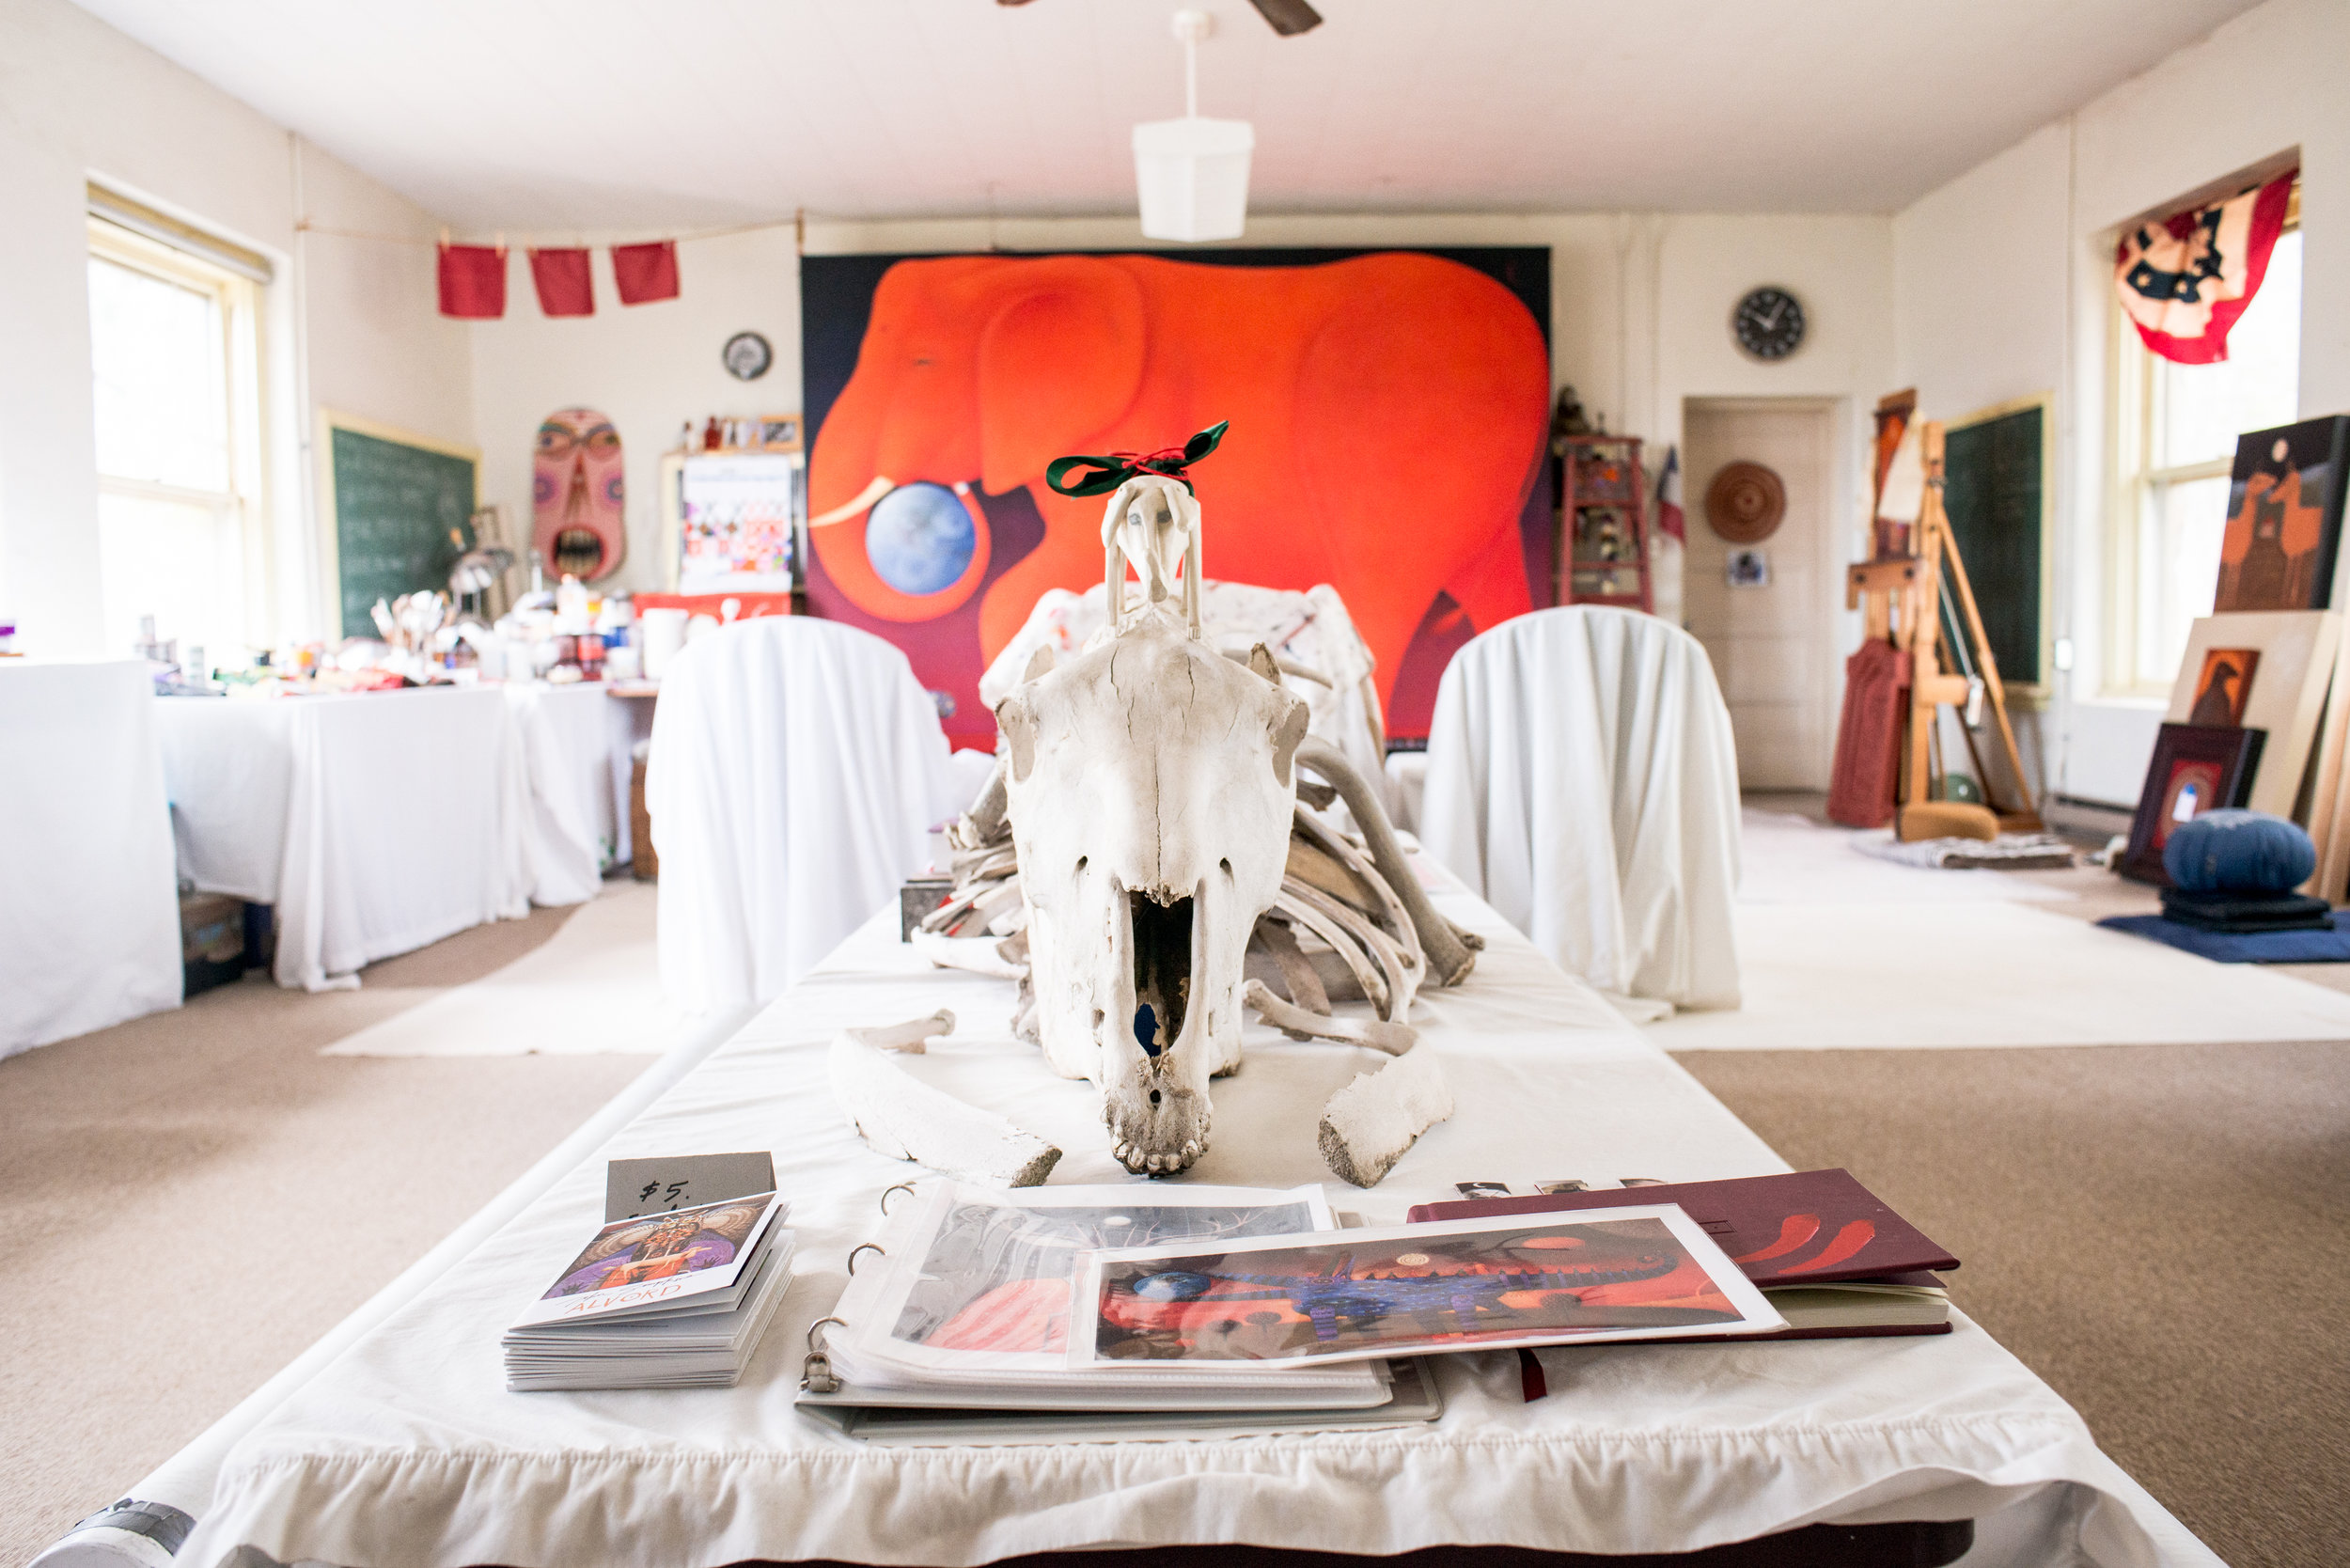 1859_Magazine_July_2016_Artist_In_Residence_John_Simpkins_Alvord_Steens_SE_Oregon_Photos_By_Talia_Jean_Galvin-42.jpg